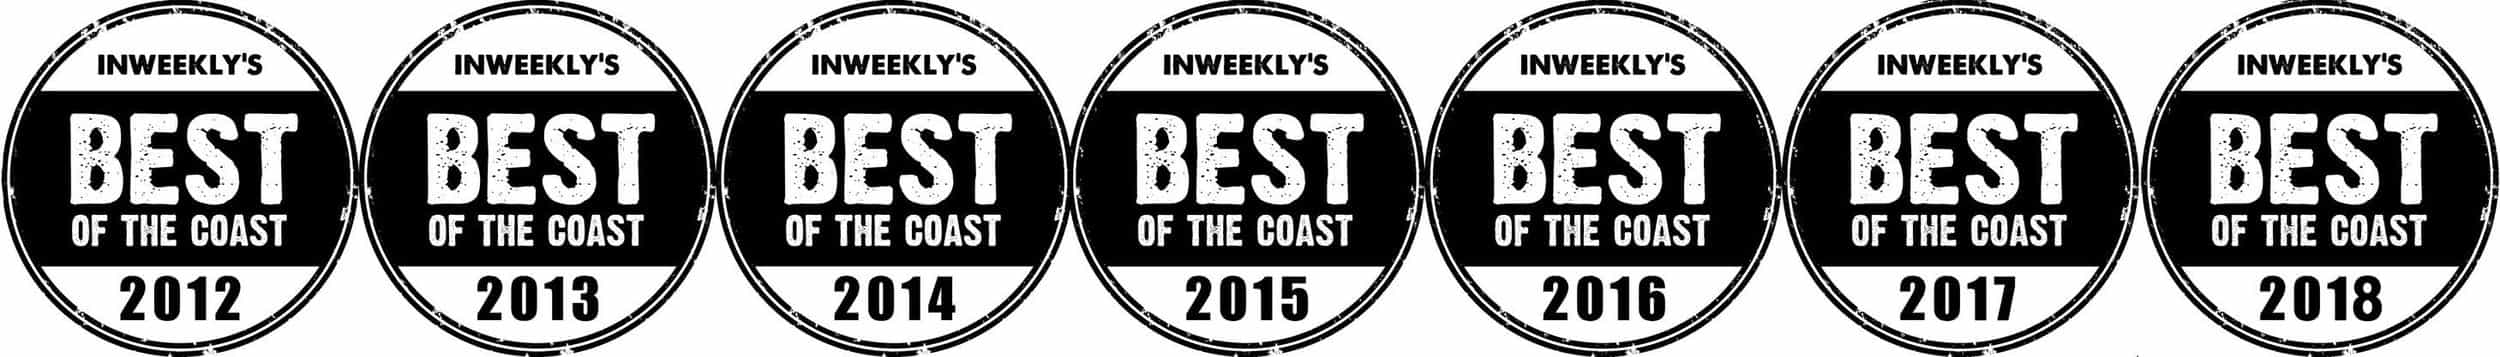 Best+of+the+Coast+Banner+2018.jpg